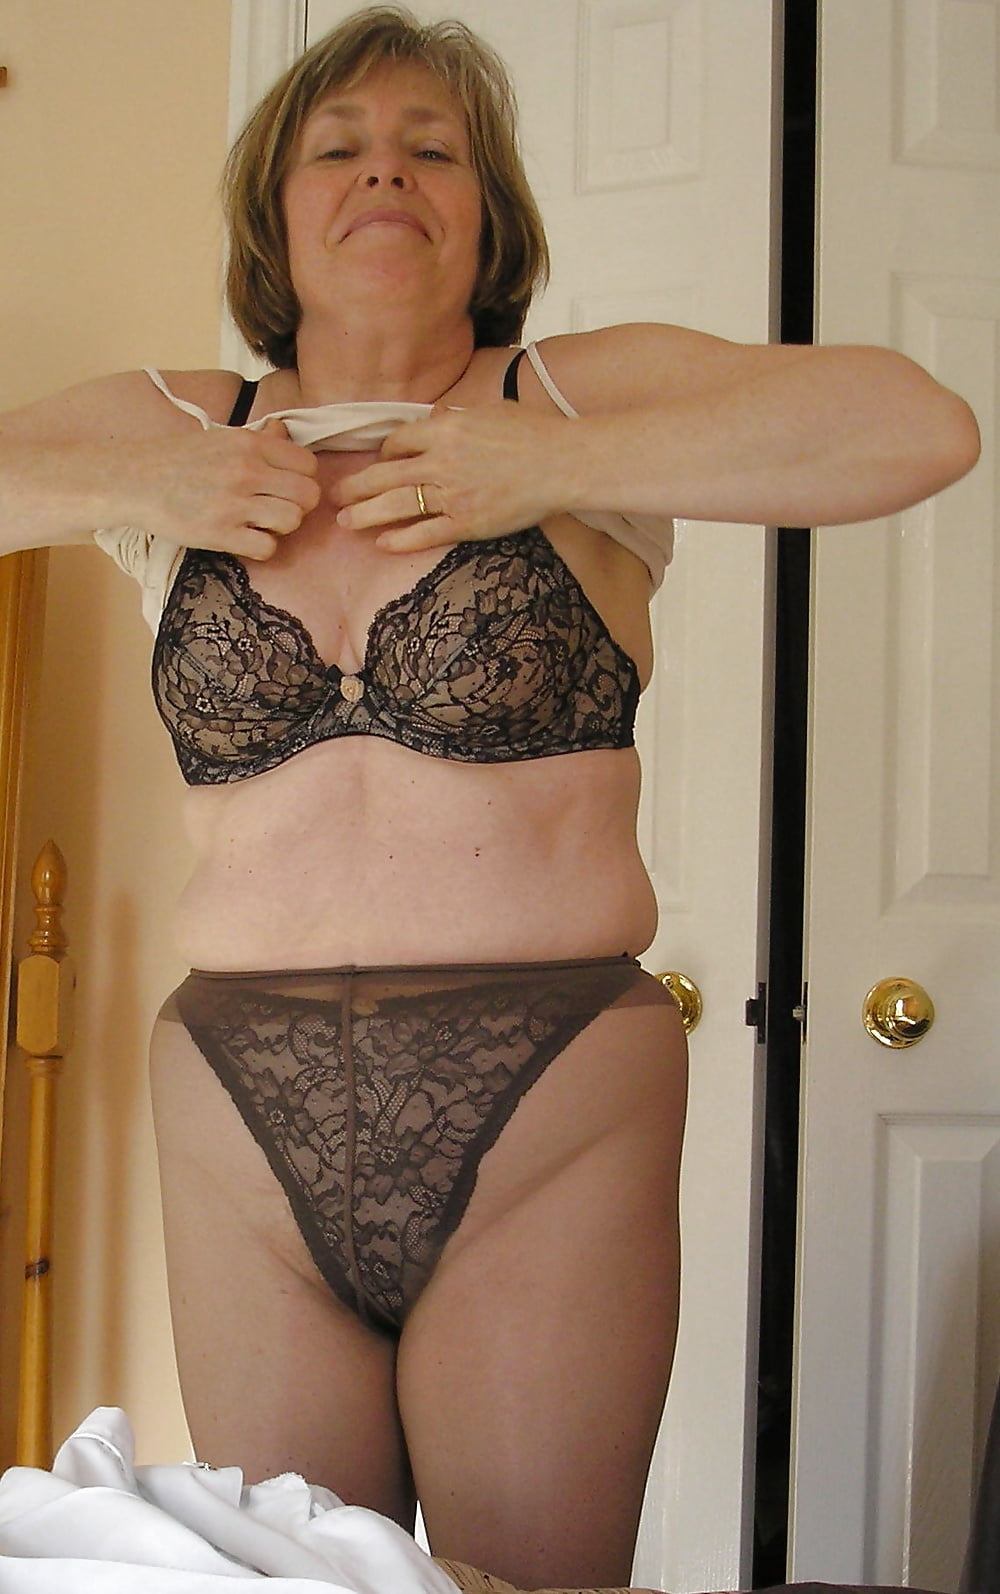 m-s-white-panties-mature-topless-pics